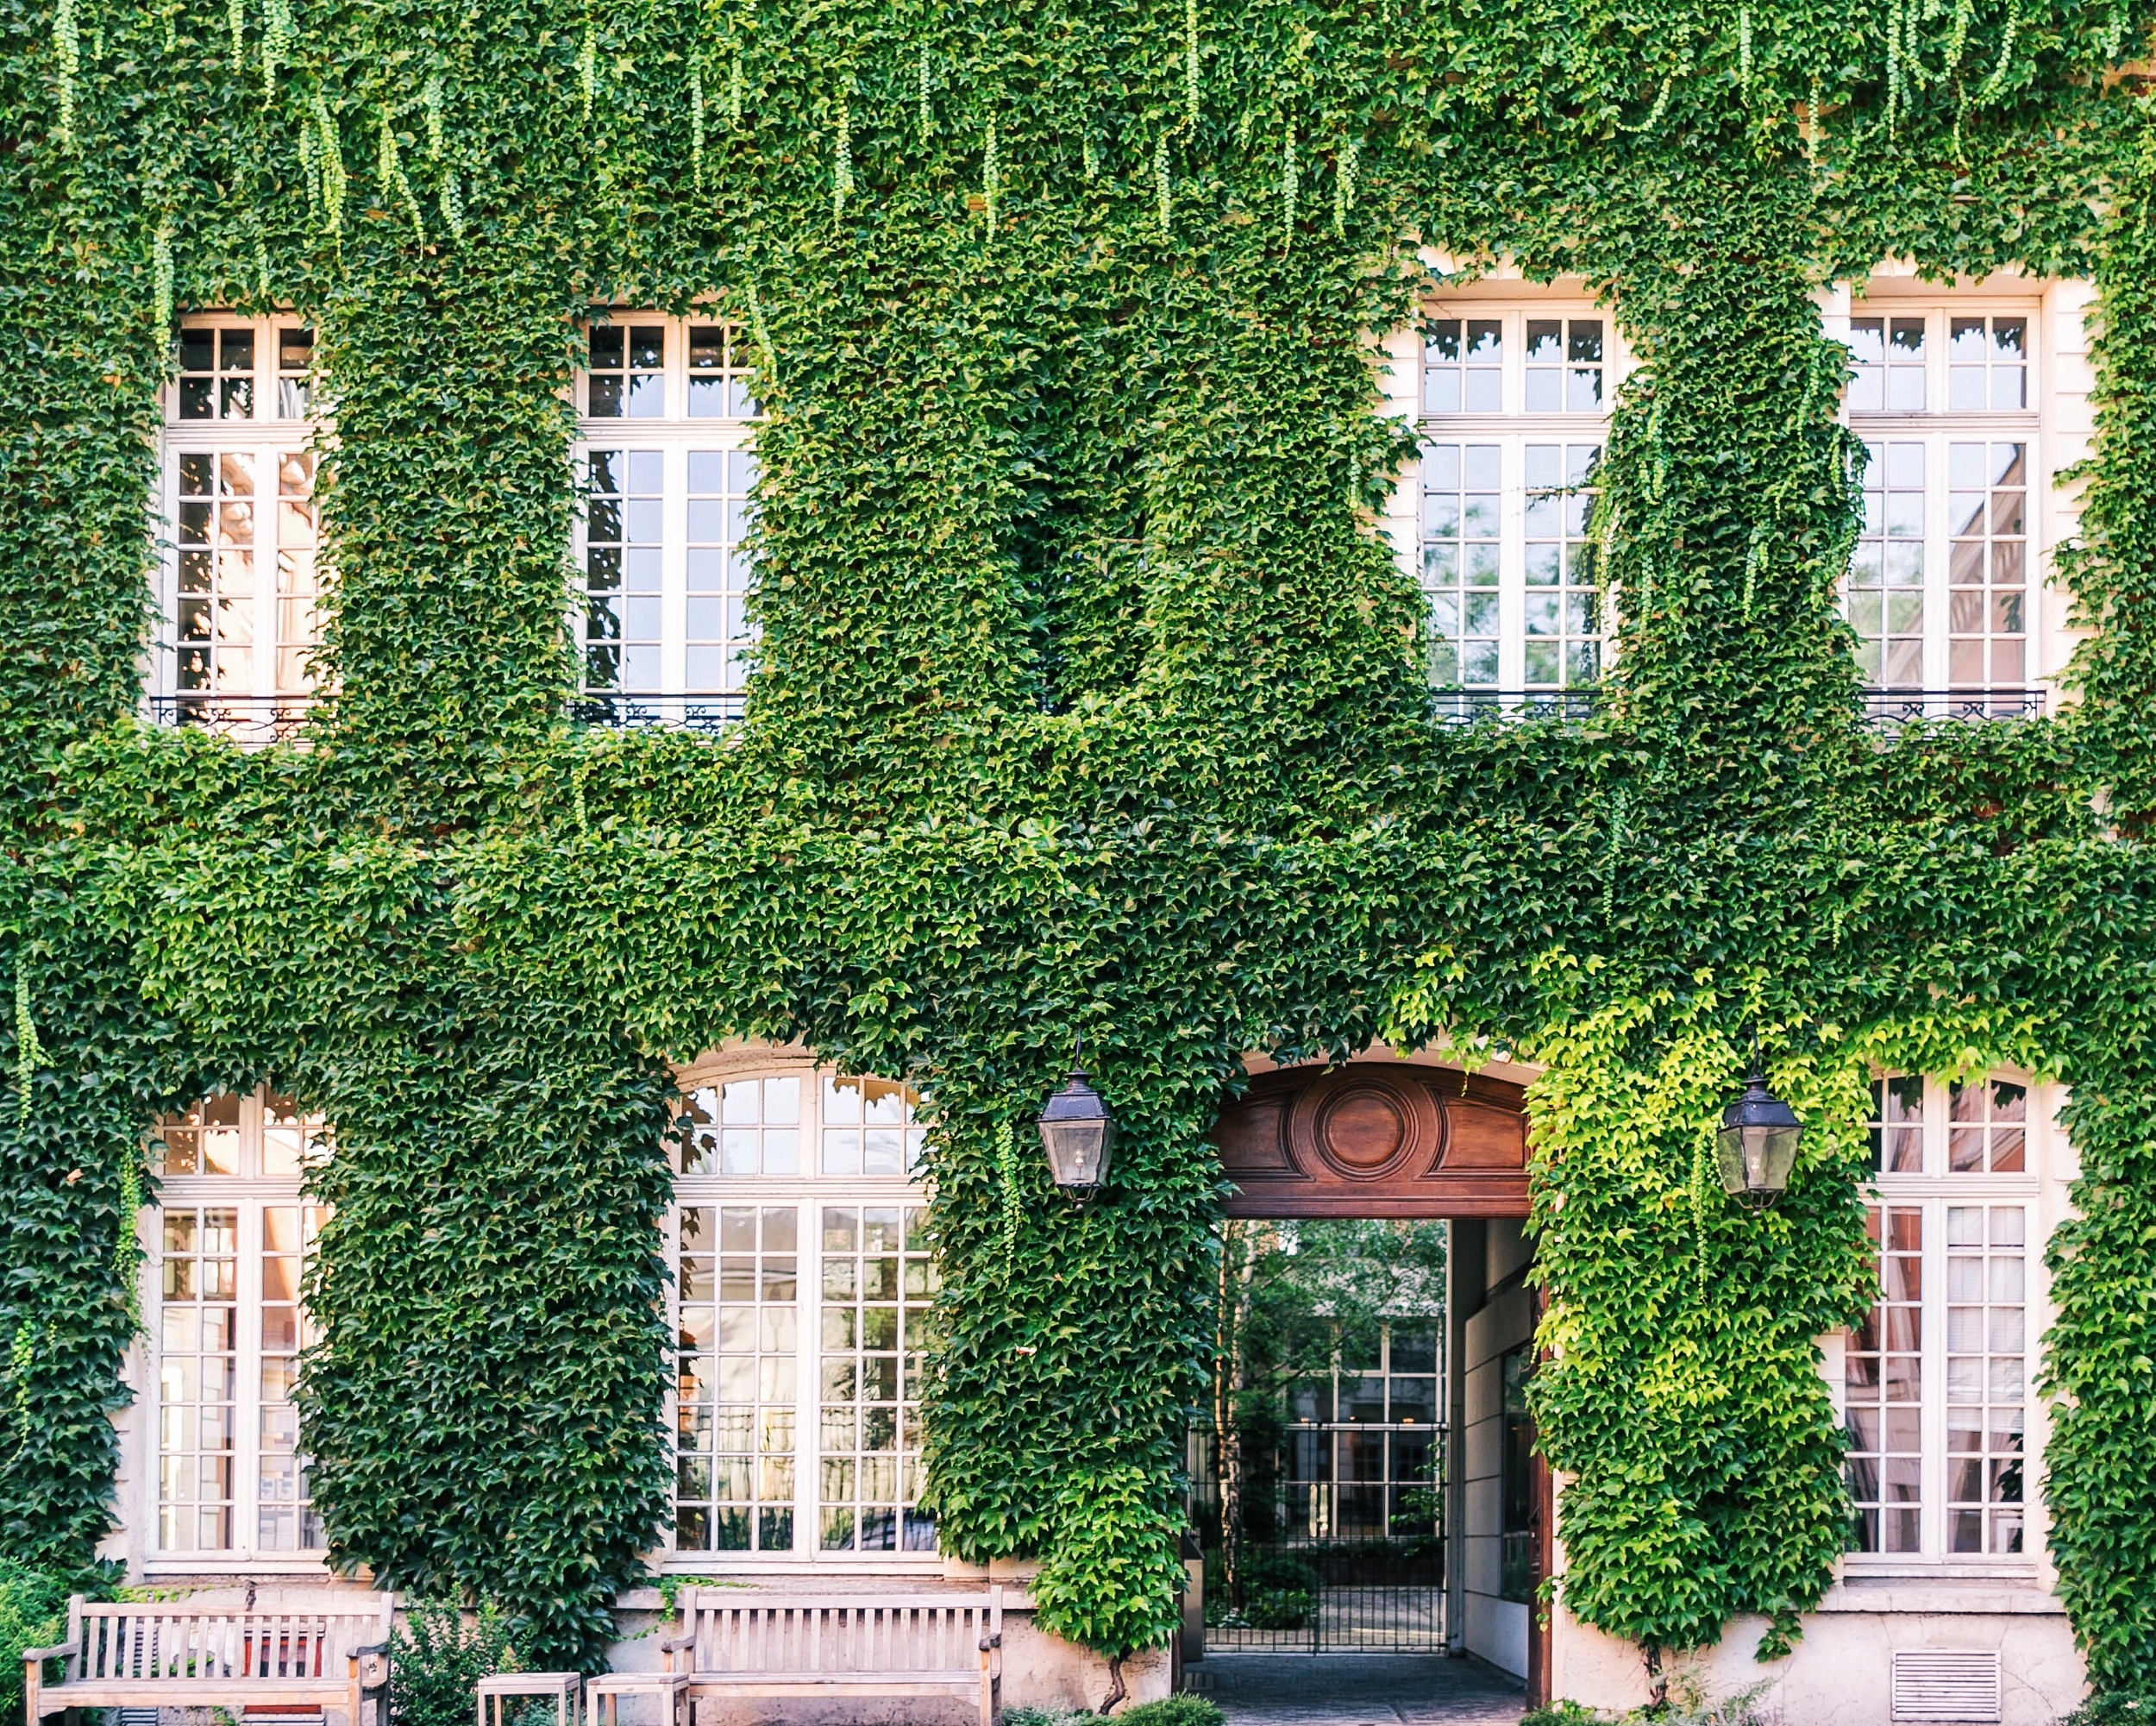 Le Marais in Paris via a Canon 6D